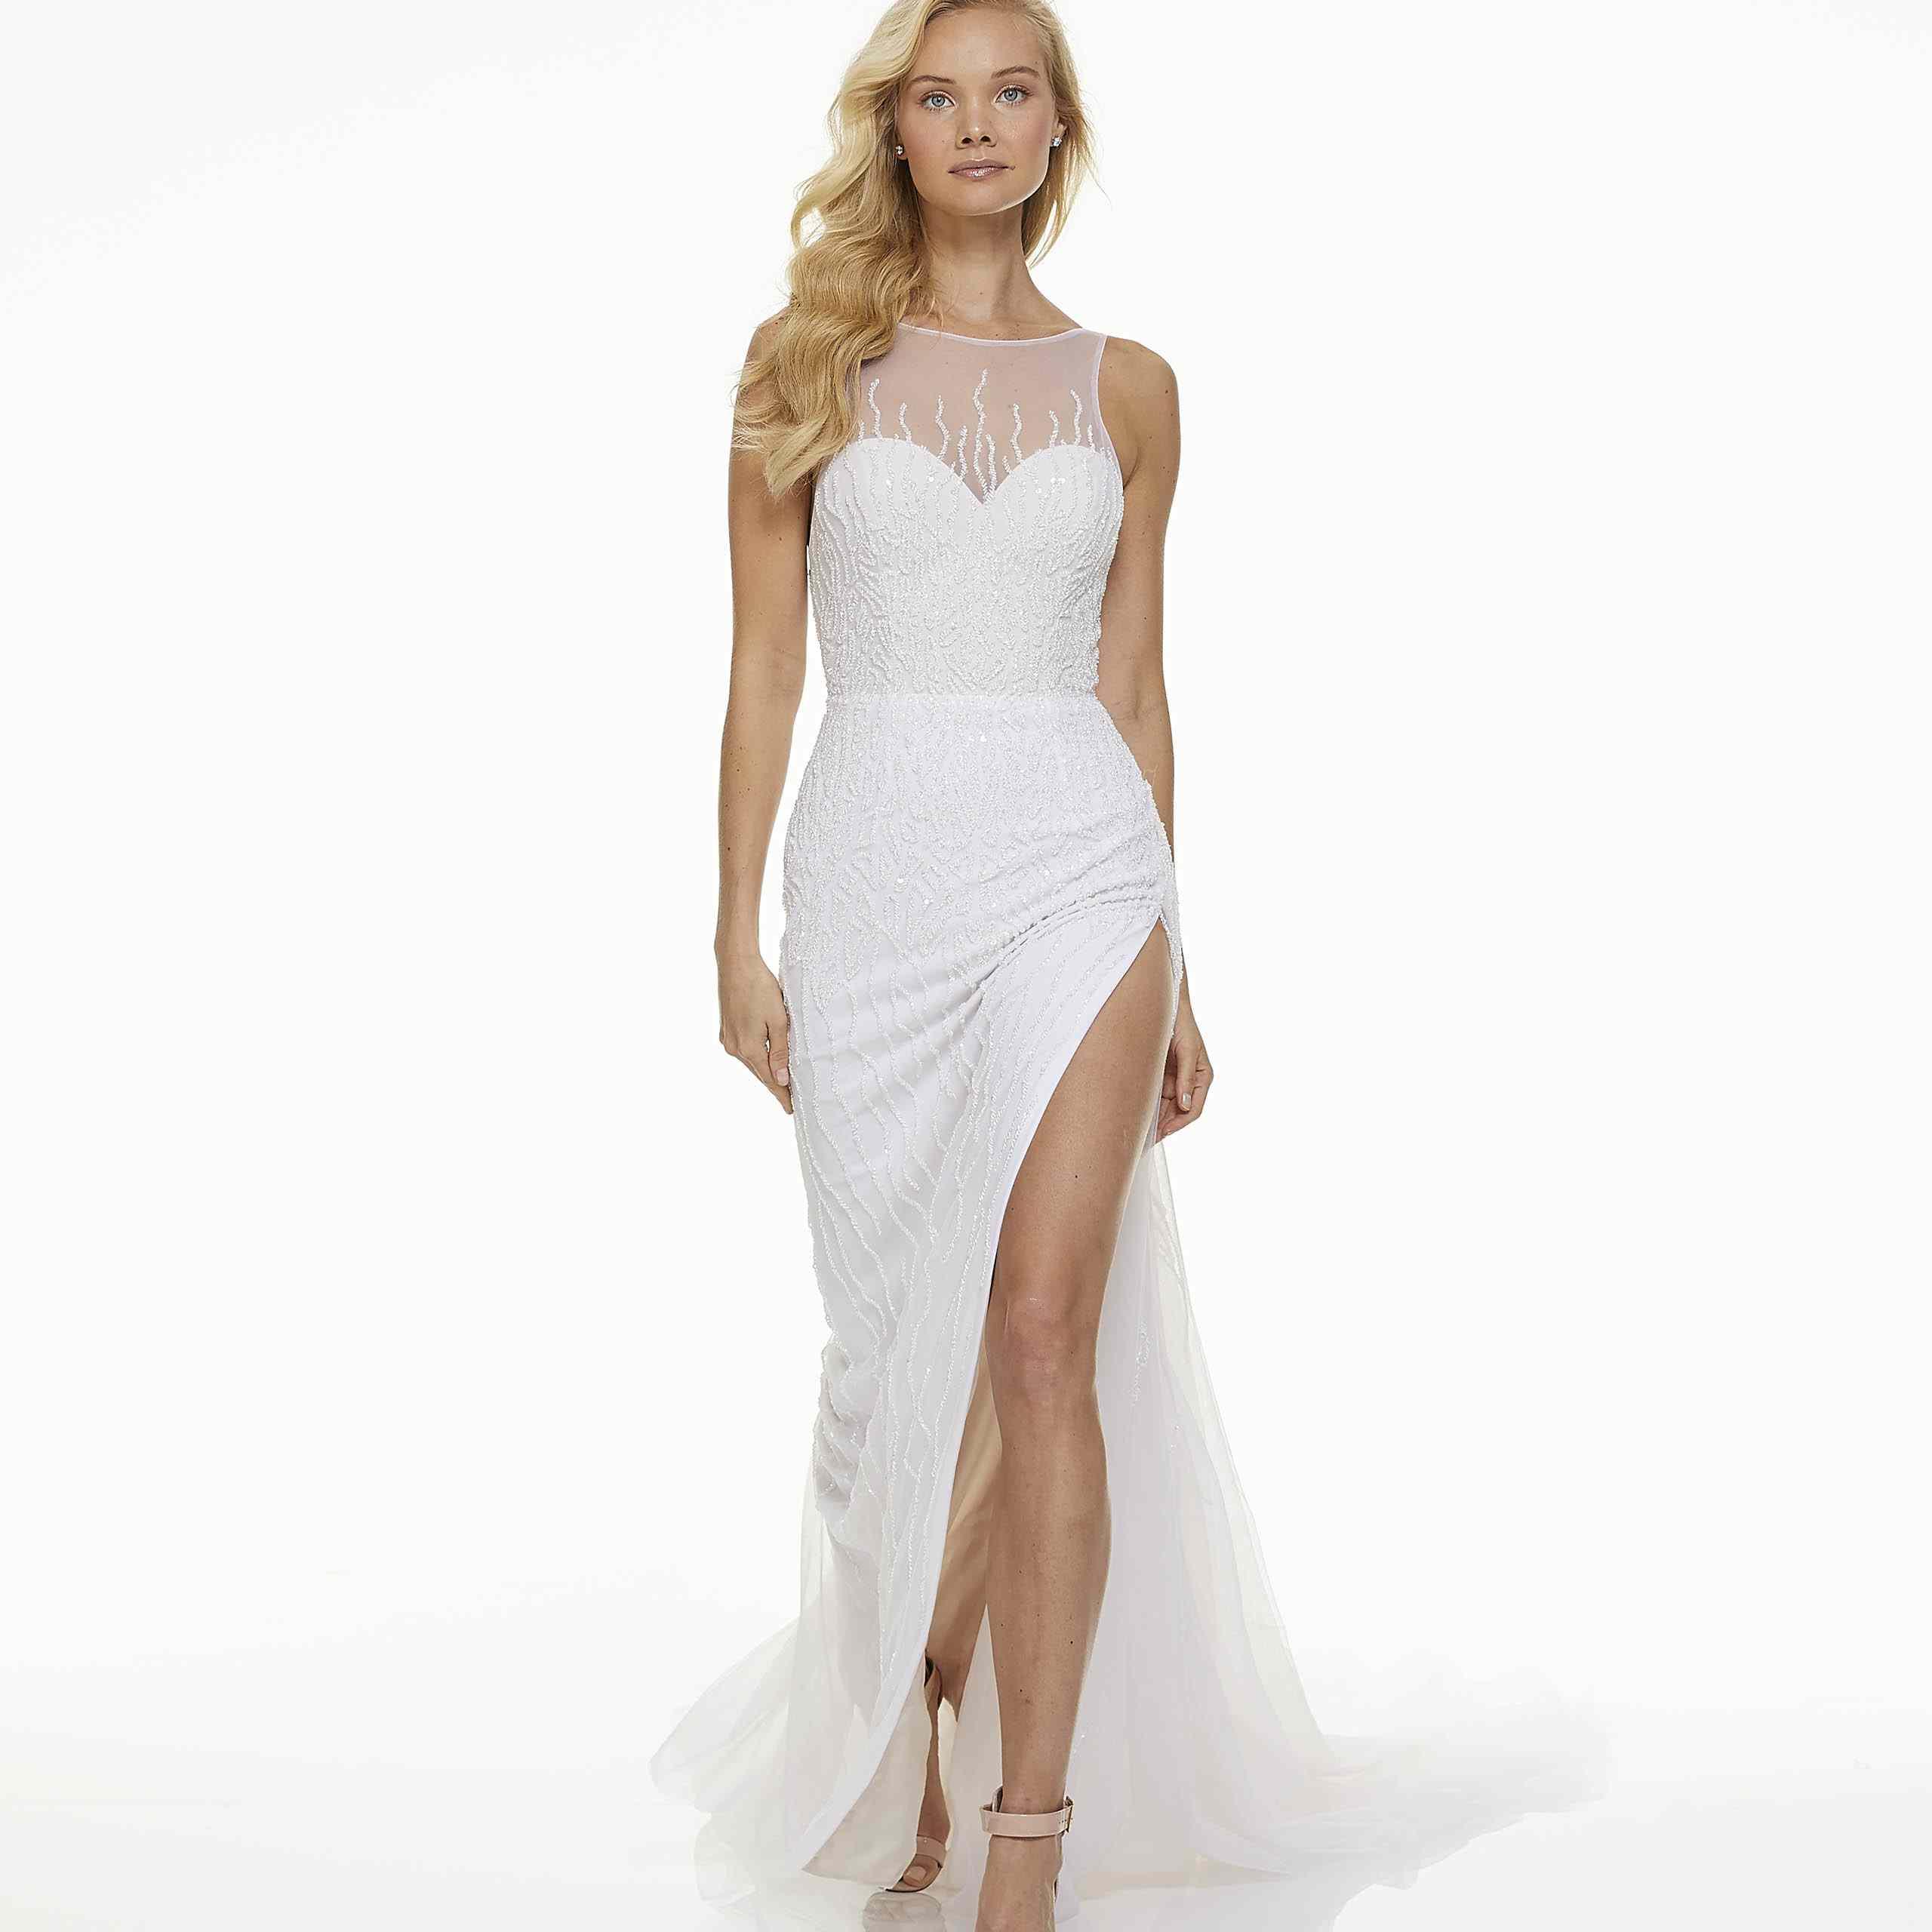 Model in sleeveless embroidered wedding dress